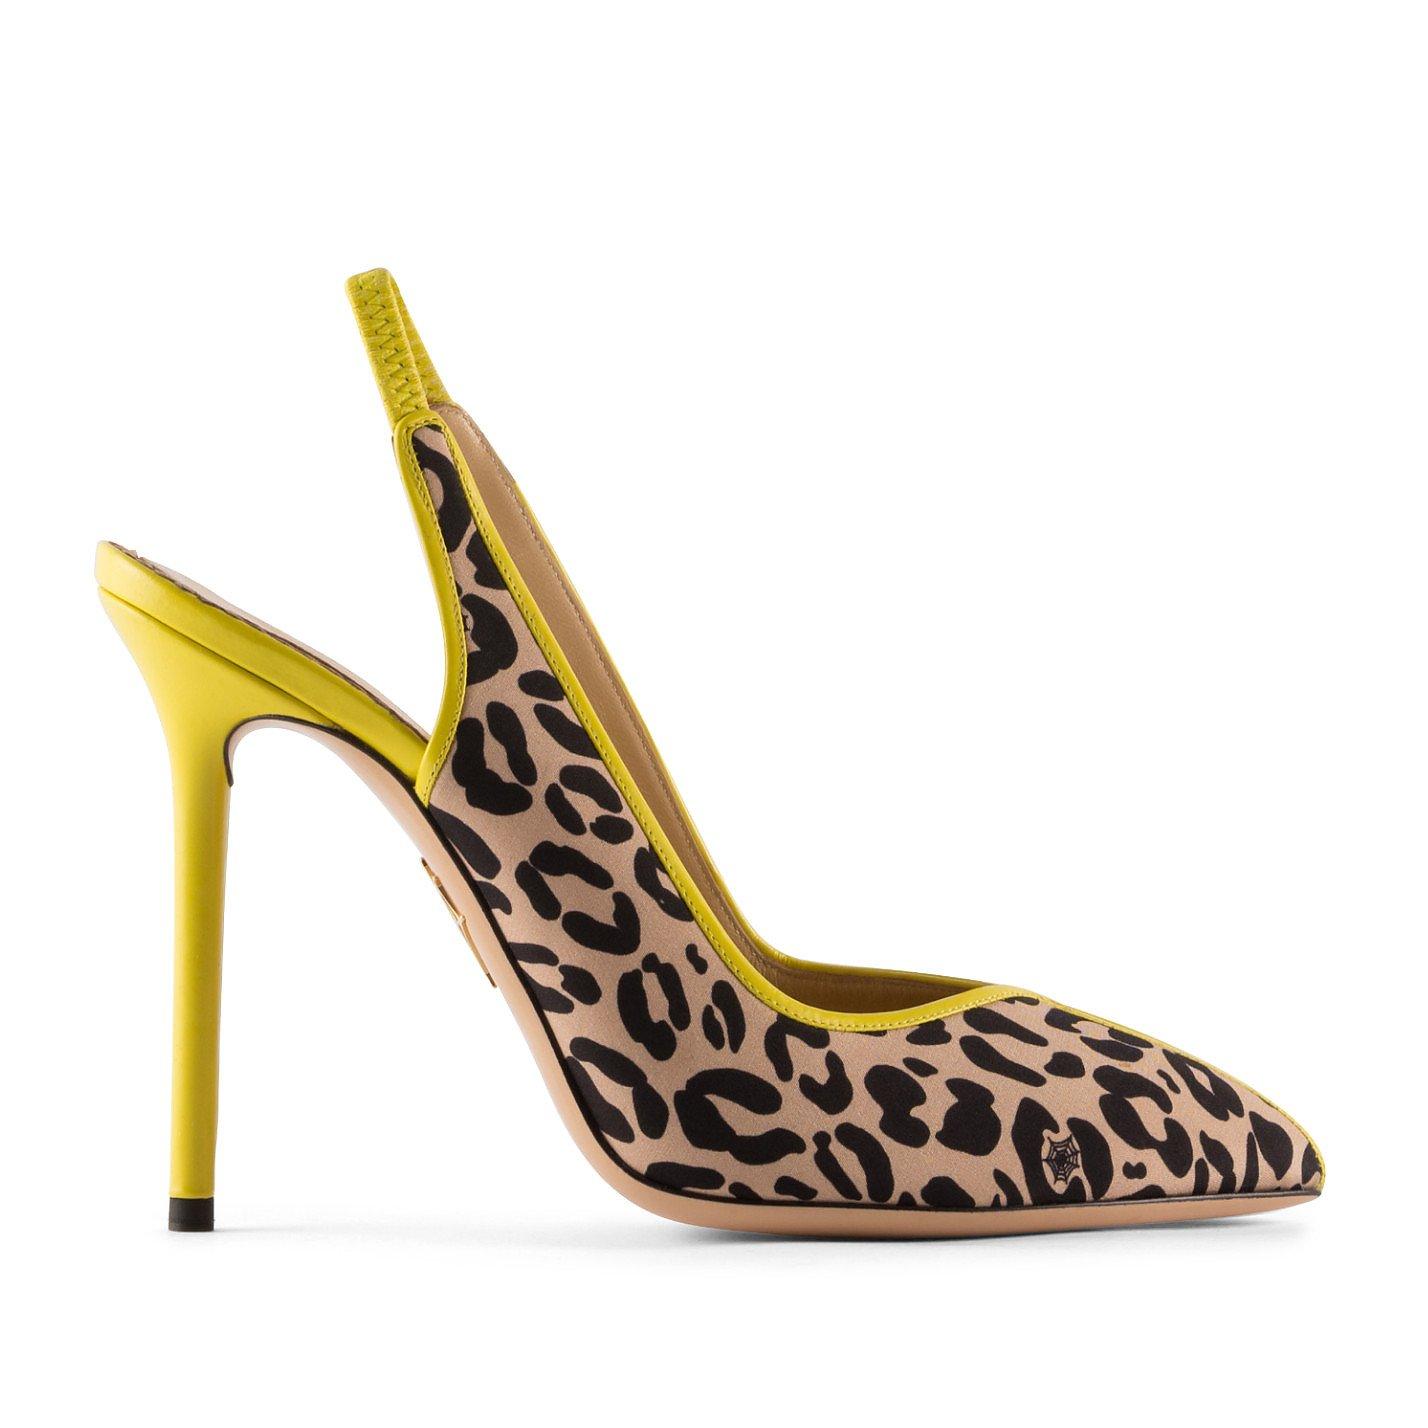 Charlotte Olympia Leopard Print Slingback Pumps